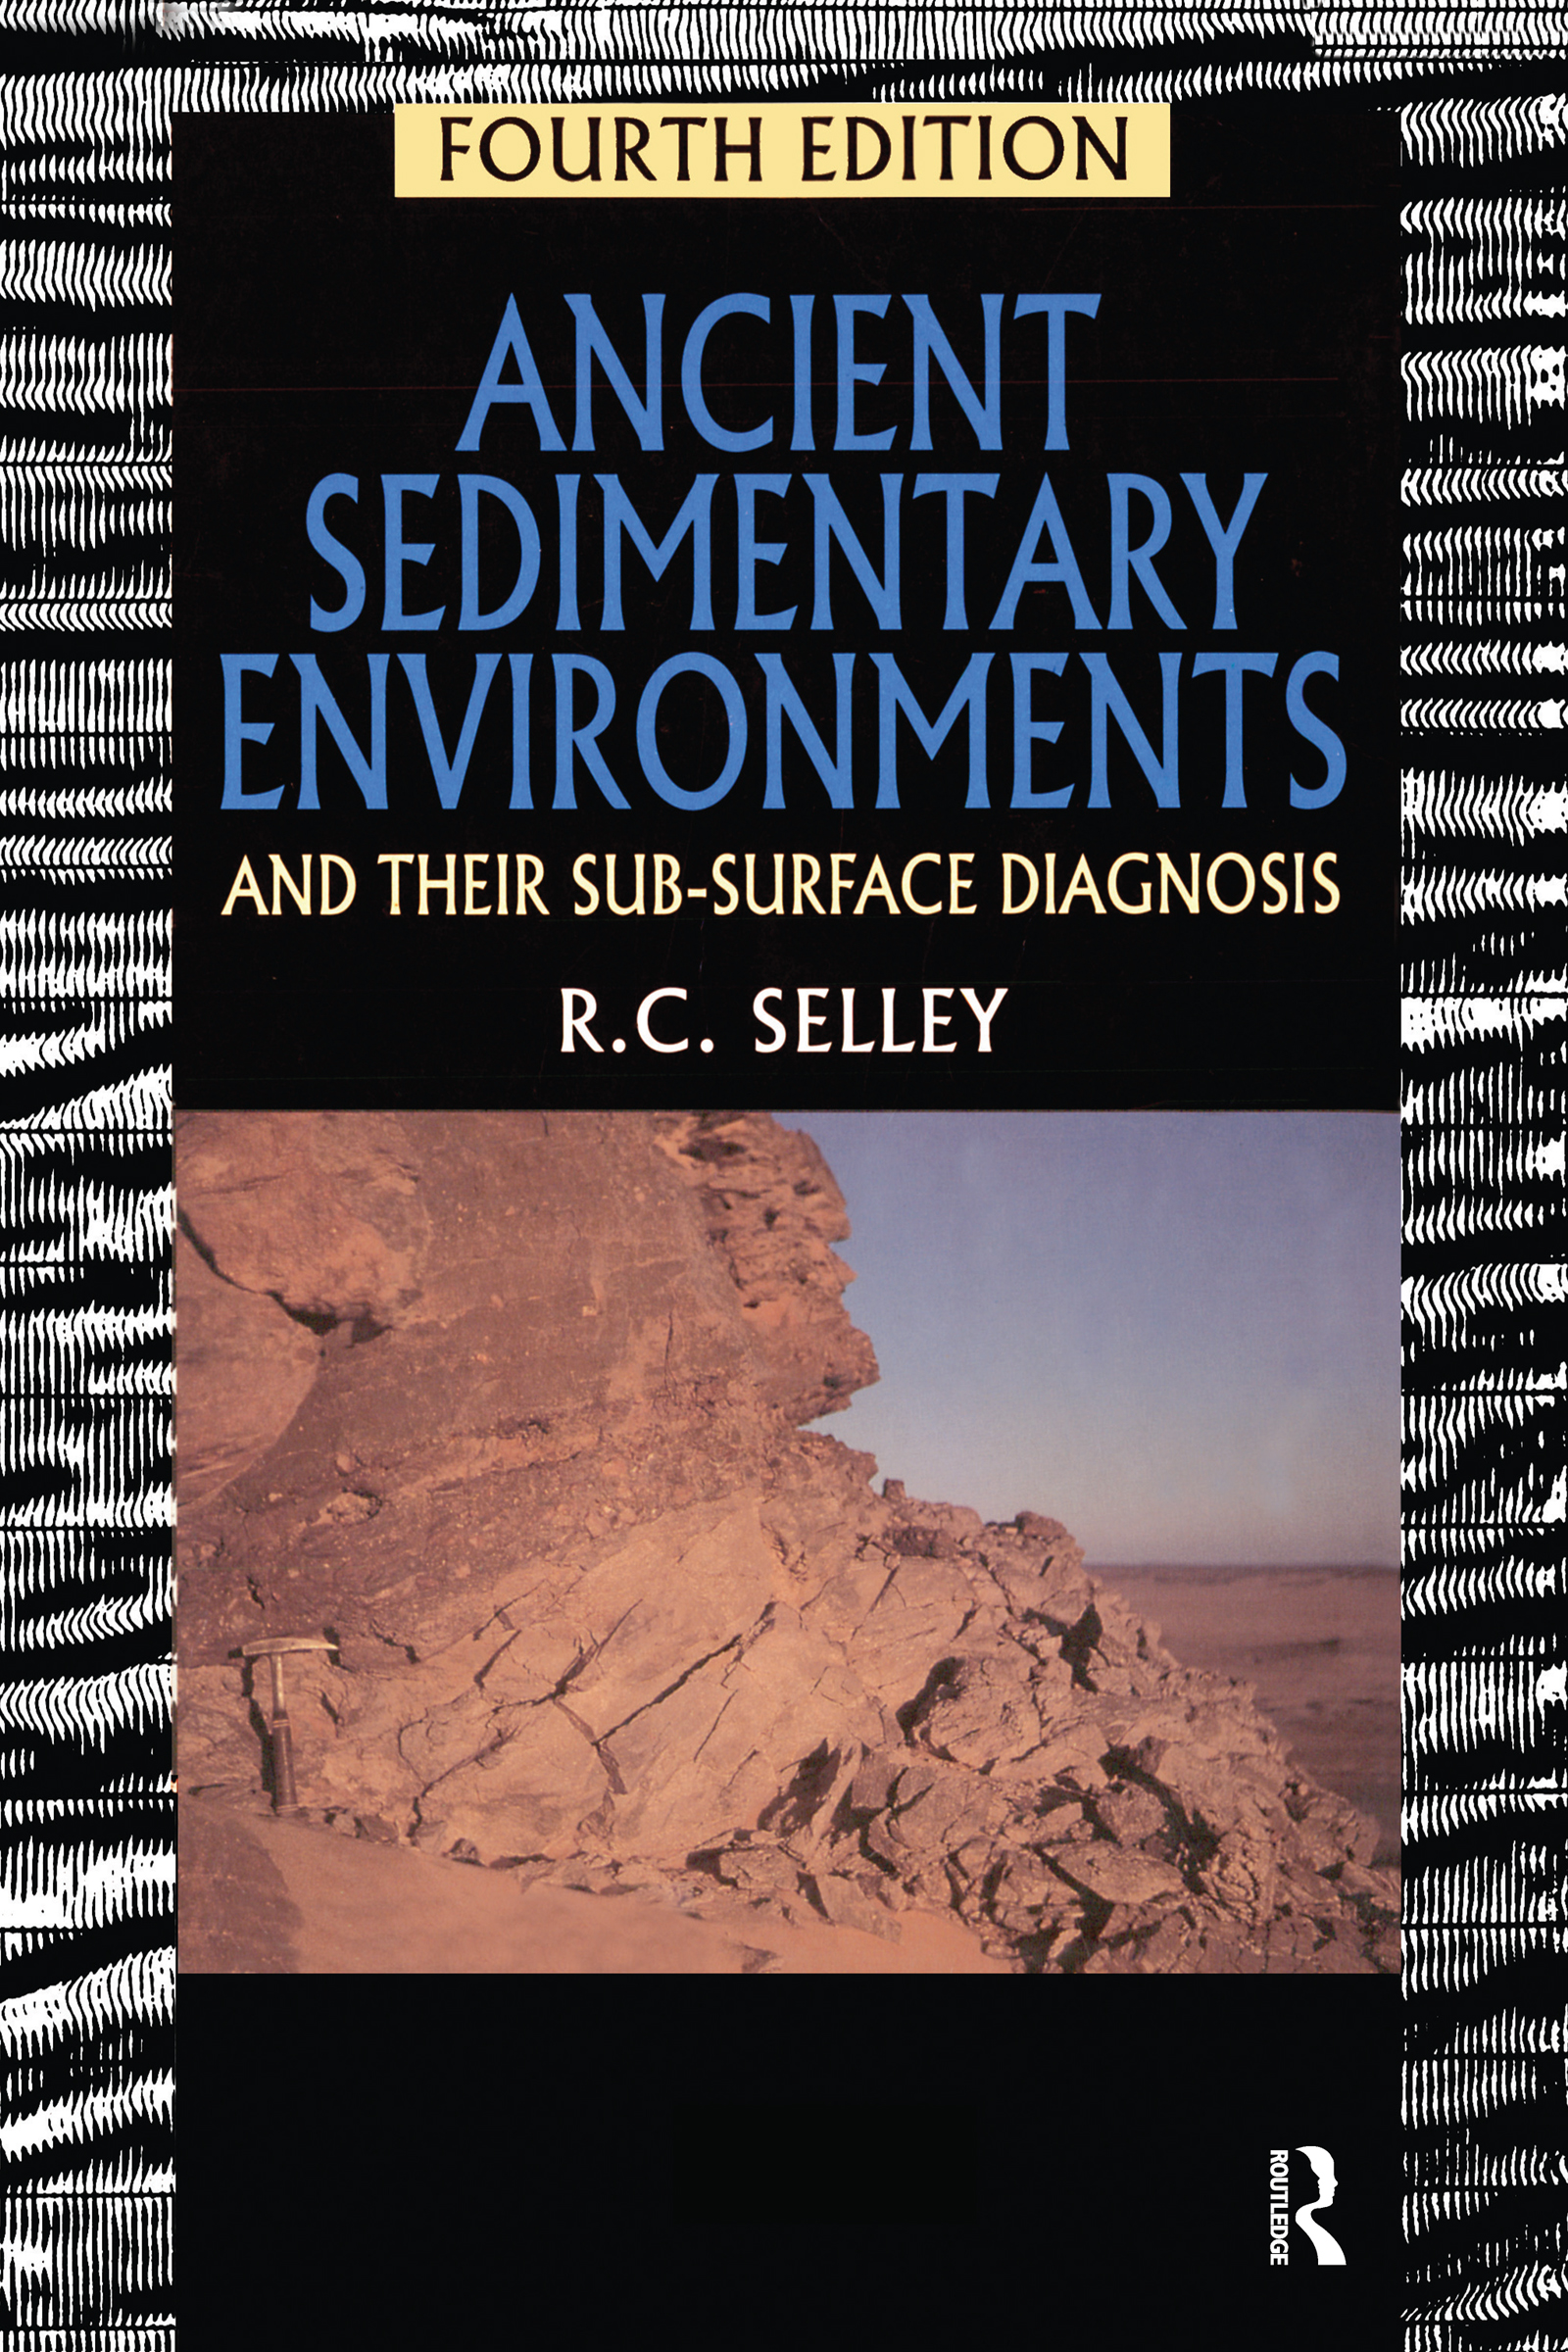 Mixed terrigenous: carbonate shorelines